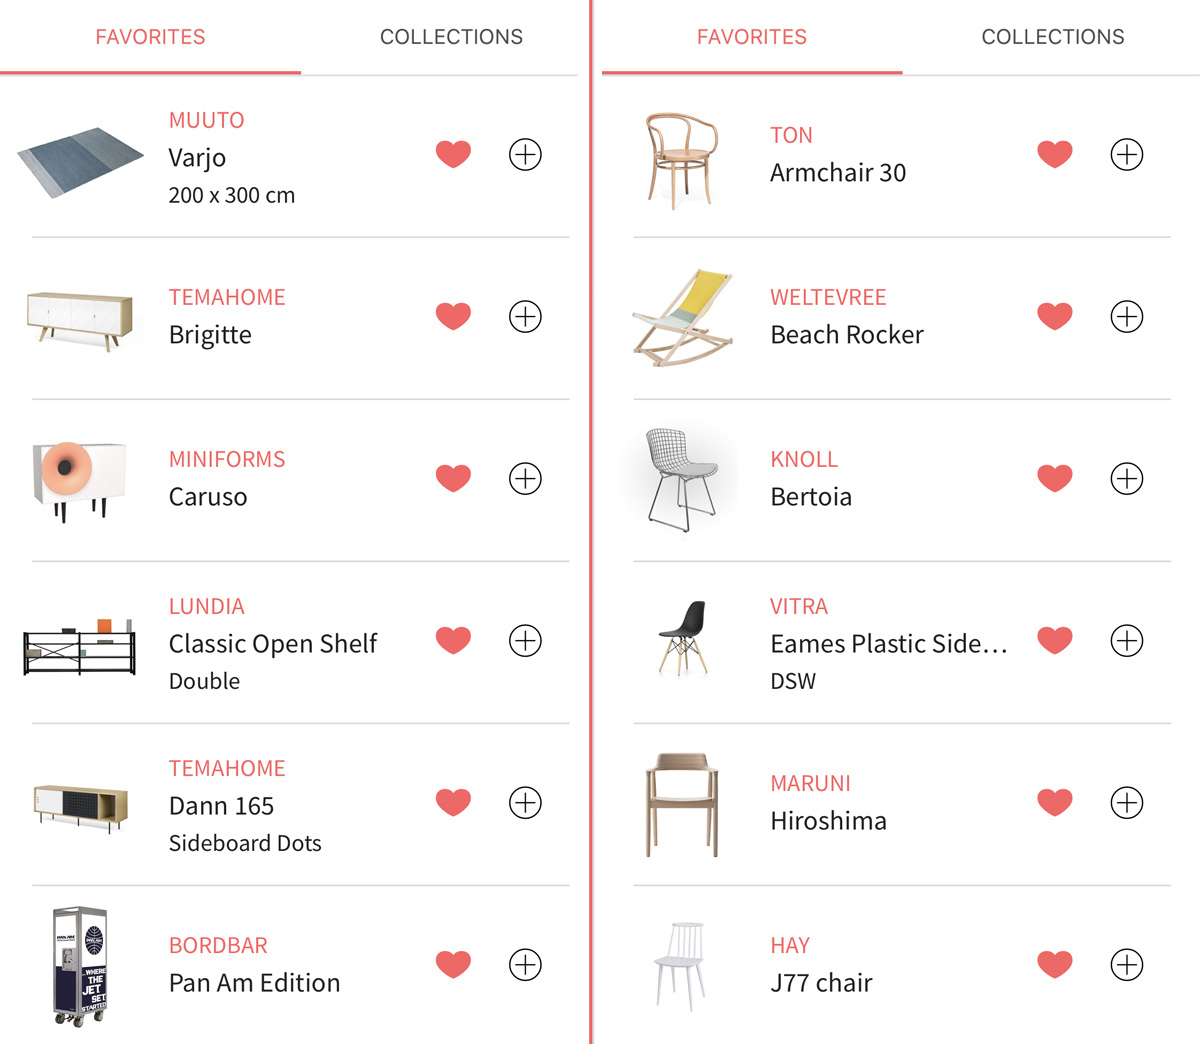 Un 39 app per arredare casa usando la realt aumentata for App arredamento